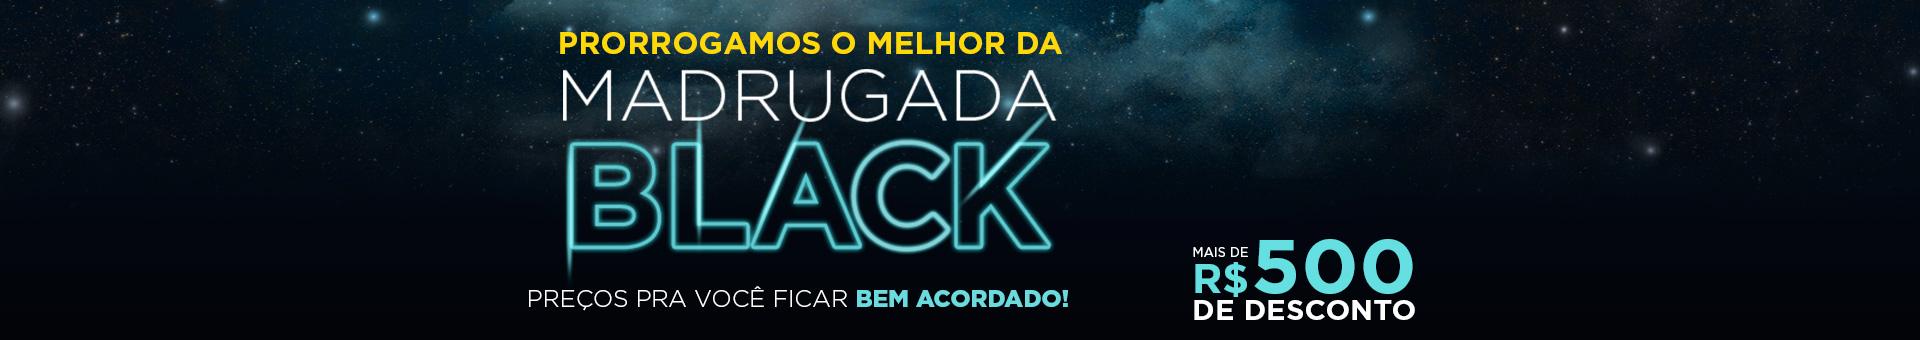 Madrugada Black